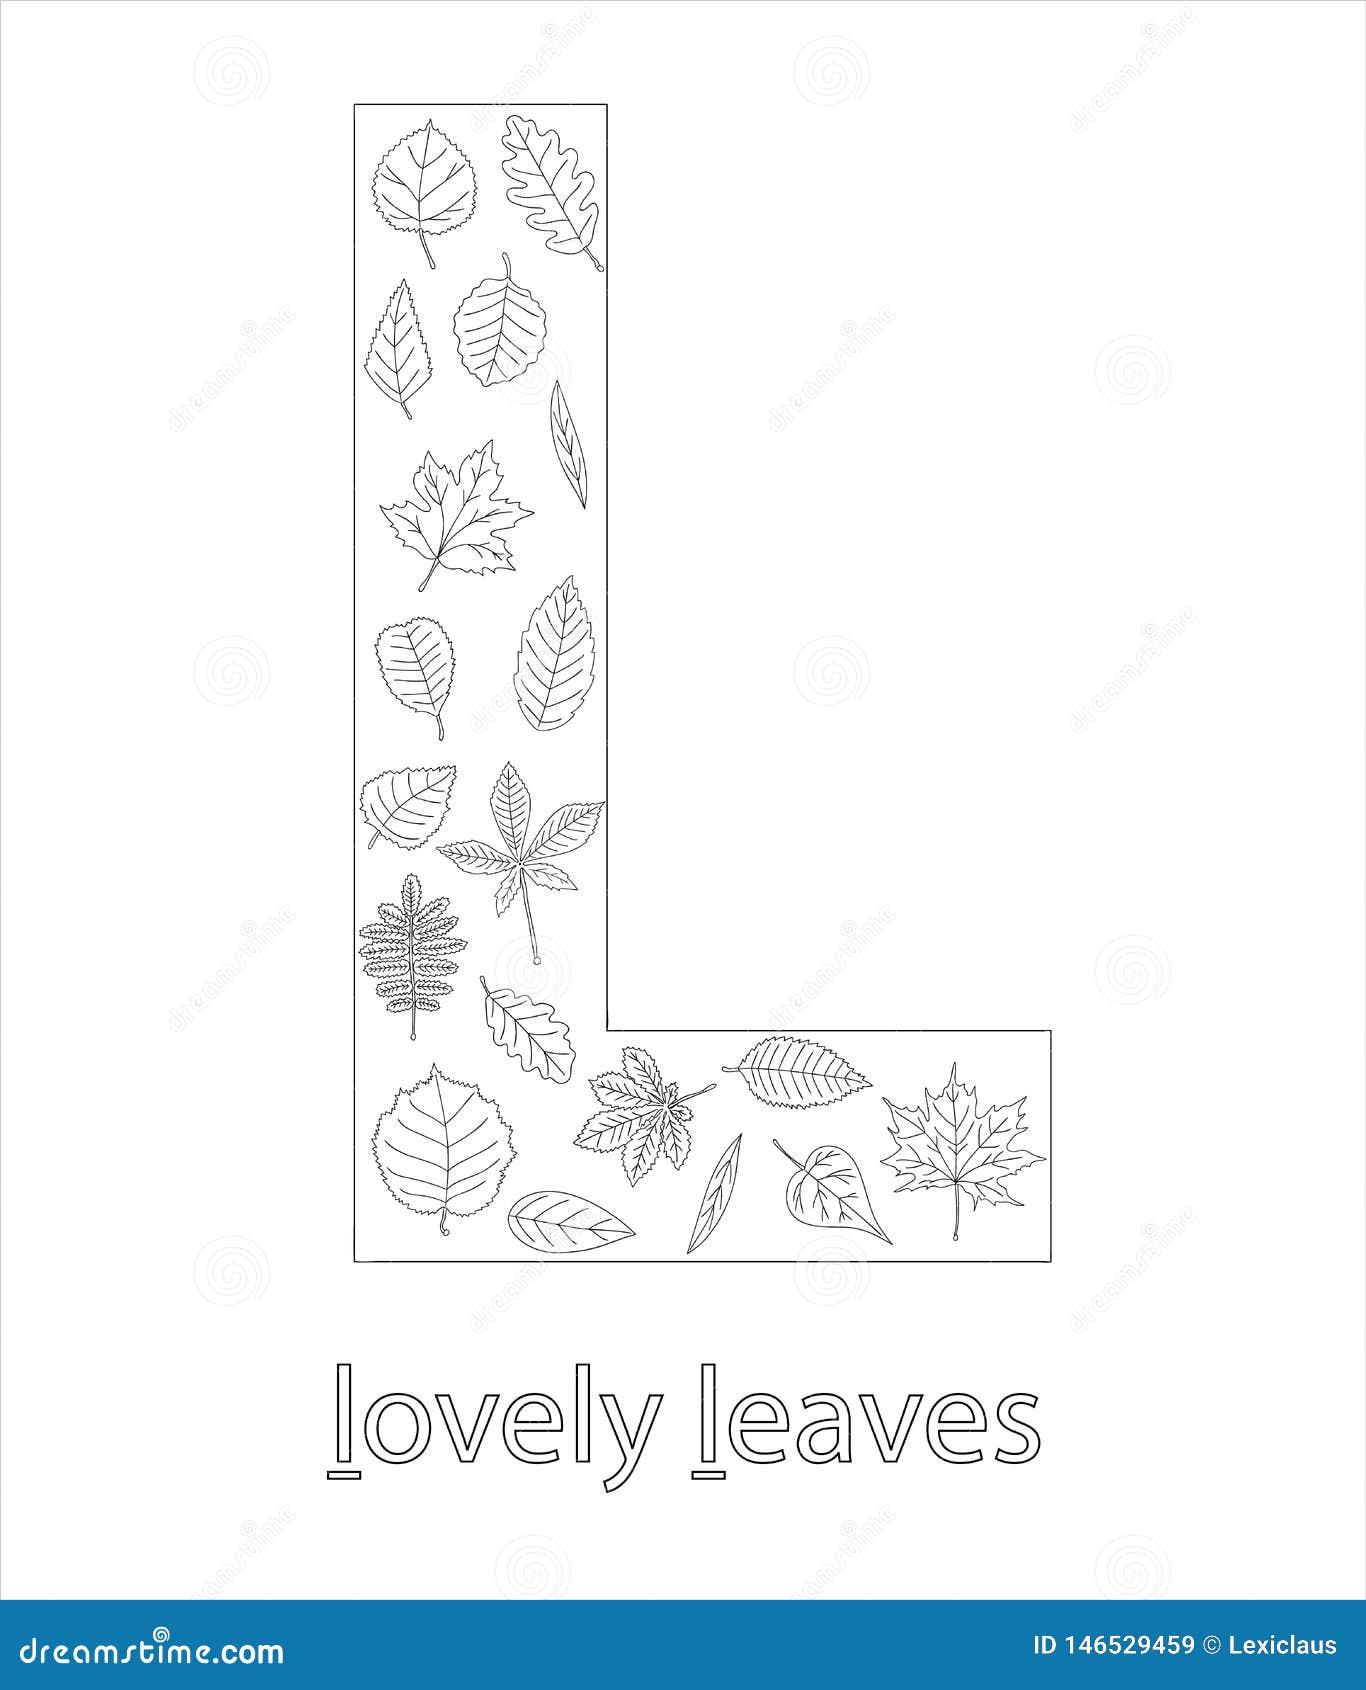 Black and white alphabet letter L. ABC flashcard